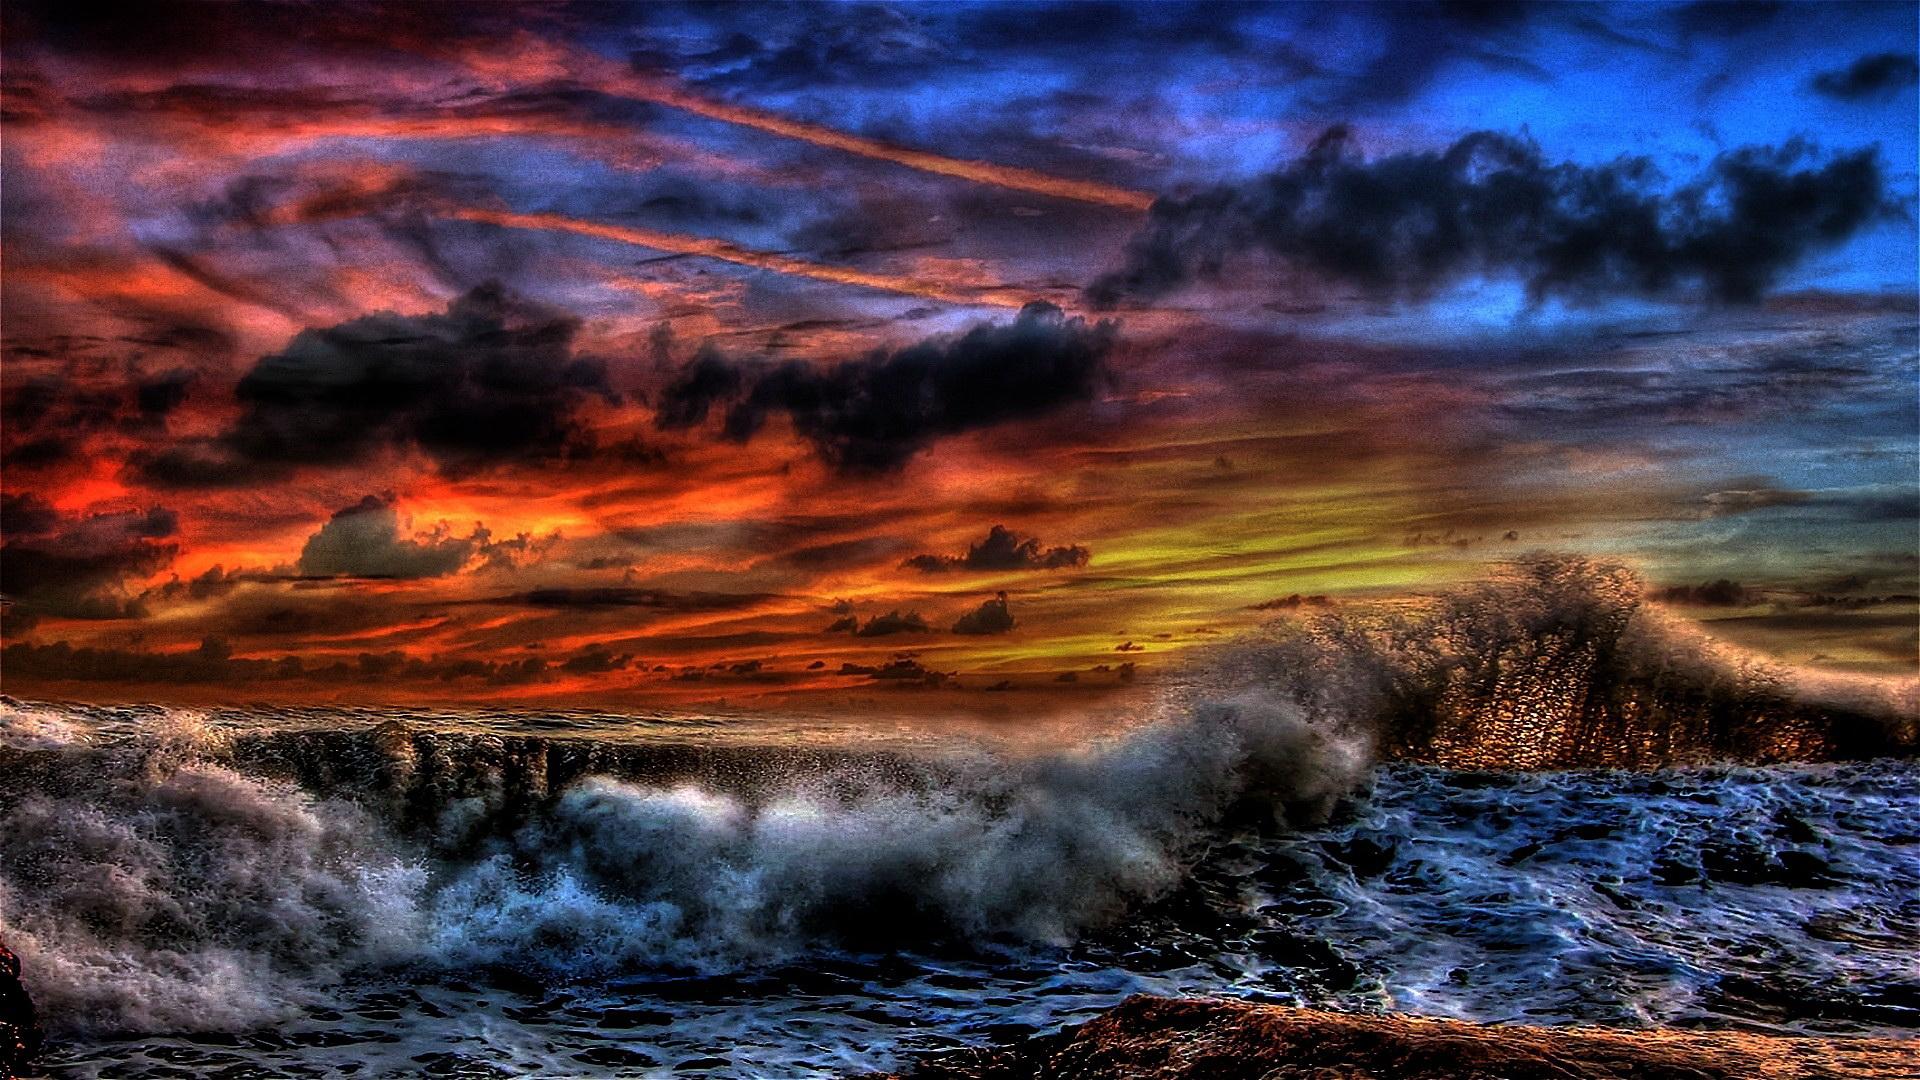 шторм солнце картинки регина радостью